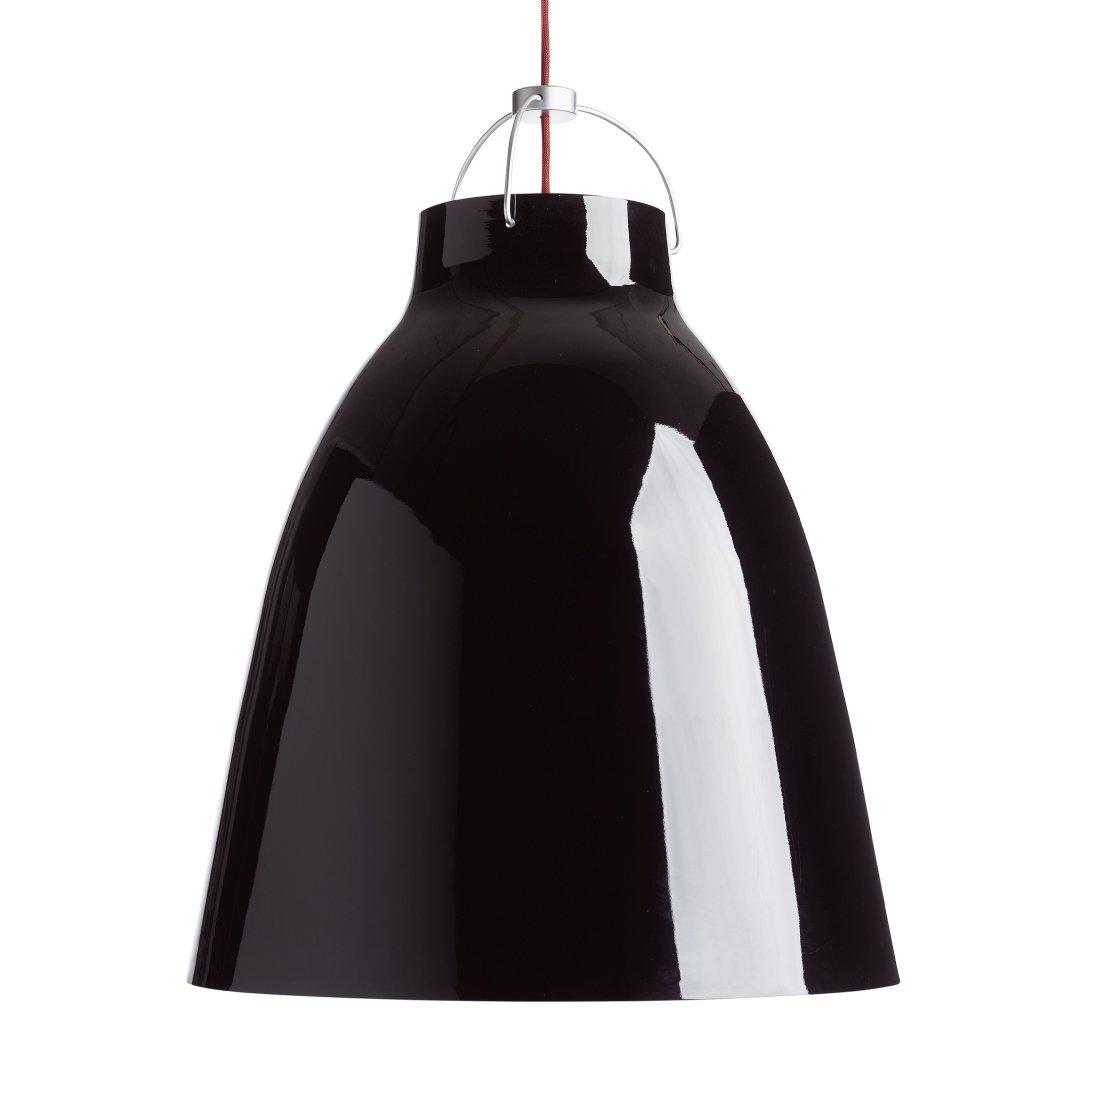 Fritz Hansen Caravaggio P4 Hoogglans Hanglamp